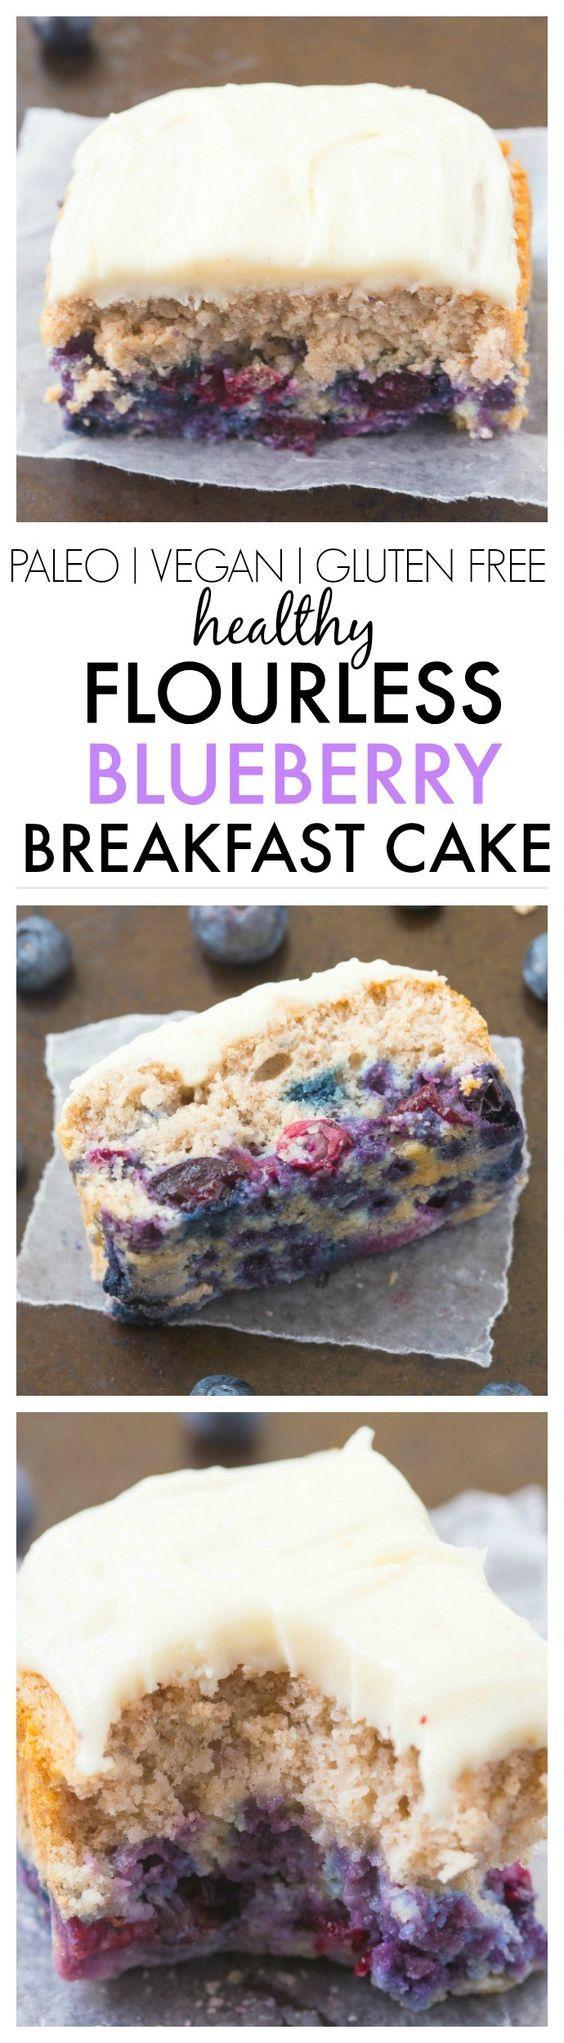 Healthy Flourless Blueberry Breakfast Cake- Light and fluffy on the inside, tender